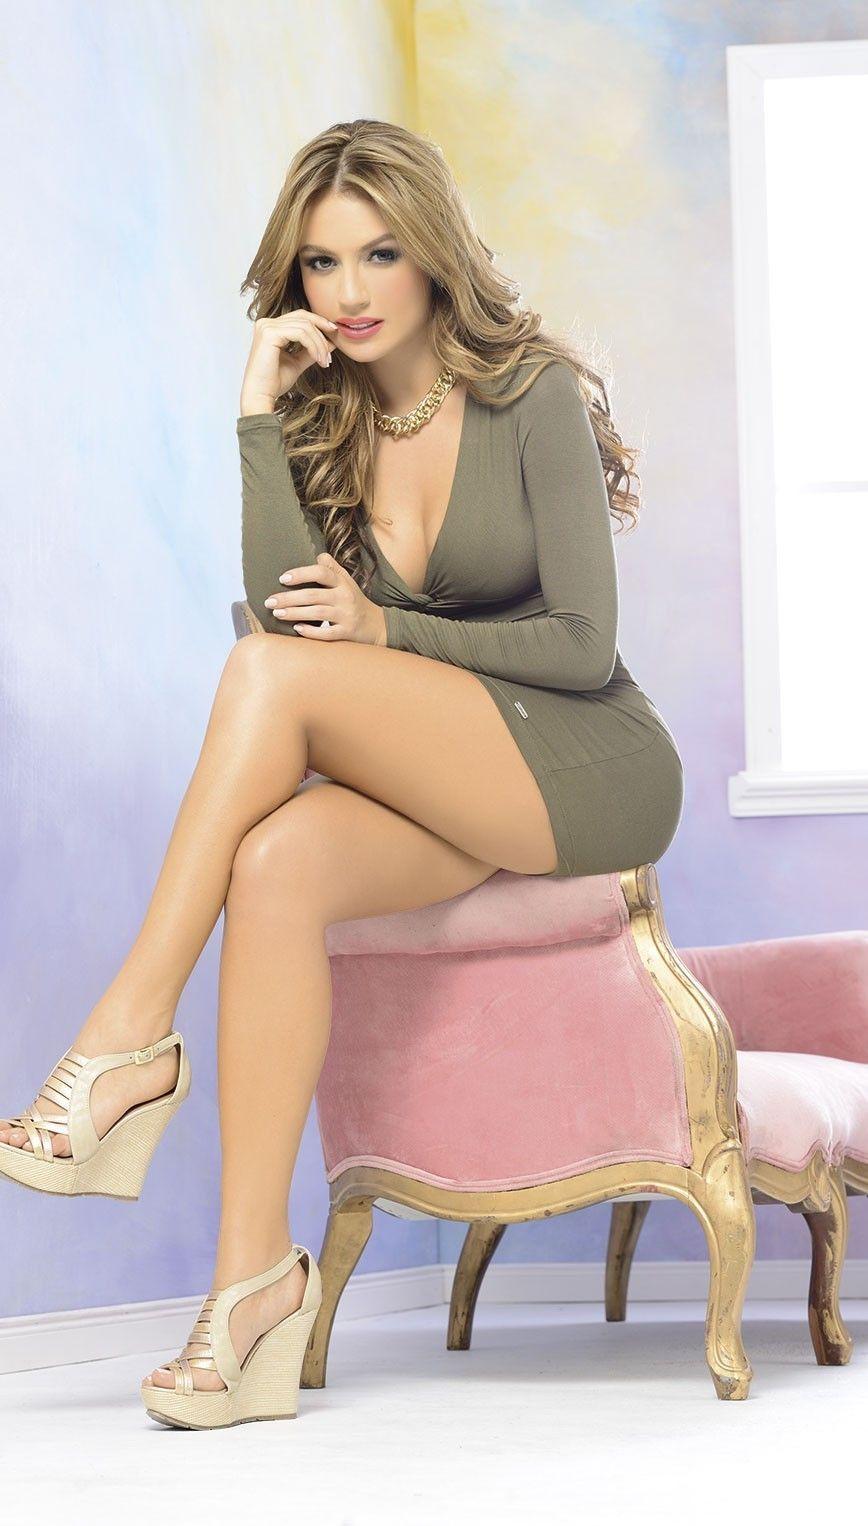 slutty girls in tight dresses | sexy short dresses | pinterest